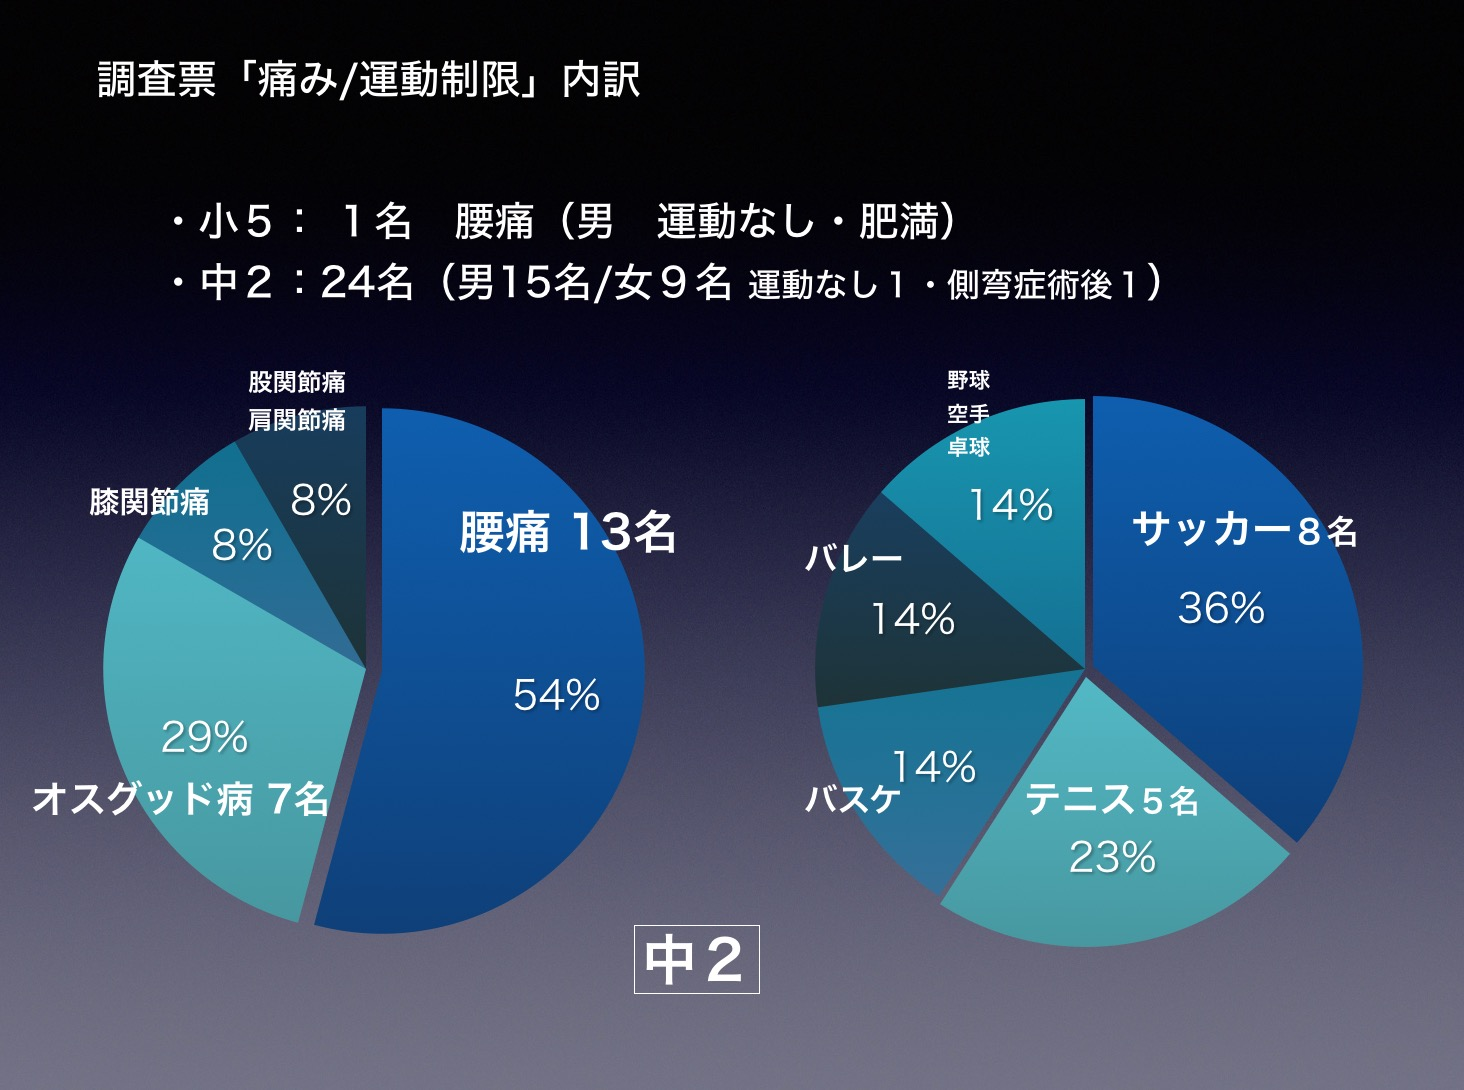 %e3%82%b9%e3%82%af%e3%83%aa%e3%83%bc%e3%83%b3%e3%82%b7%e3%83%a7%e3%83%83%e3%83%88-2016-09-08-10-20-49